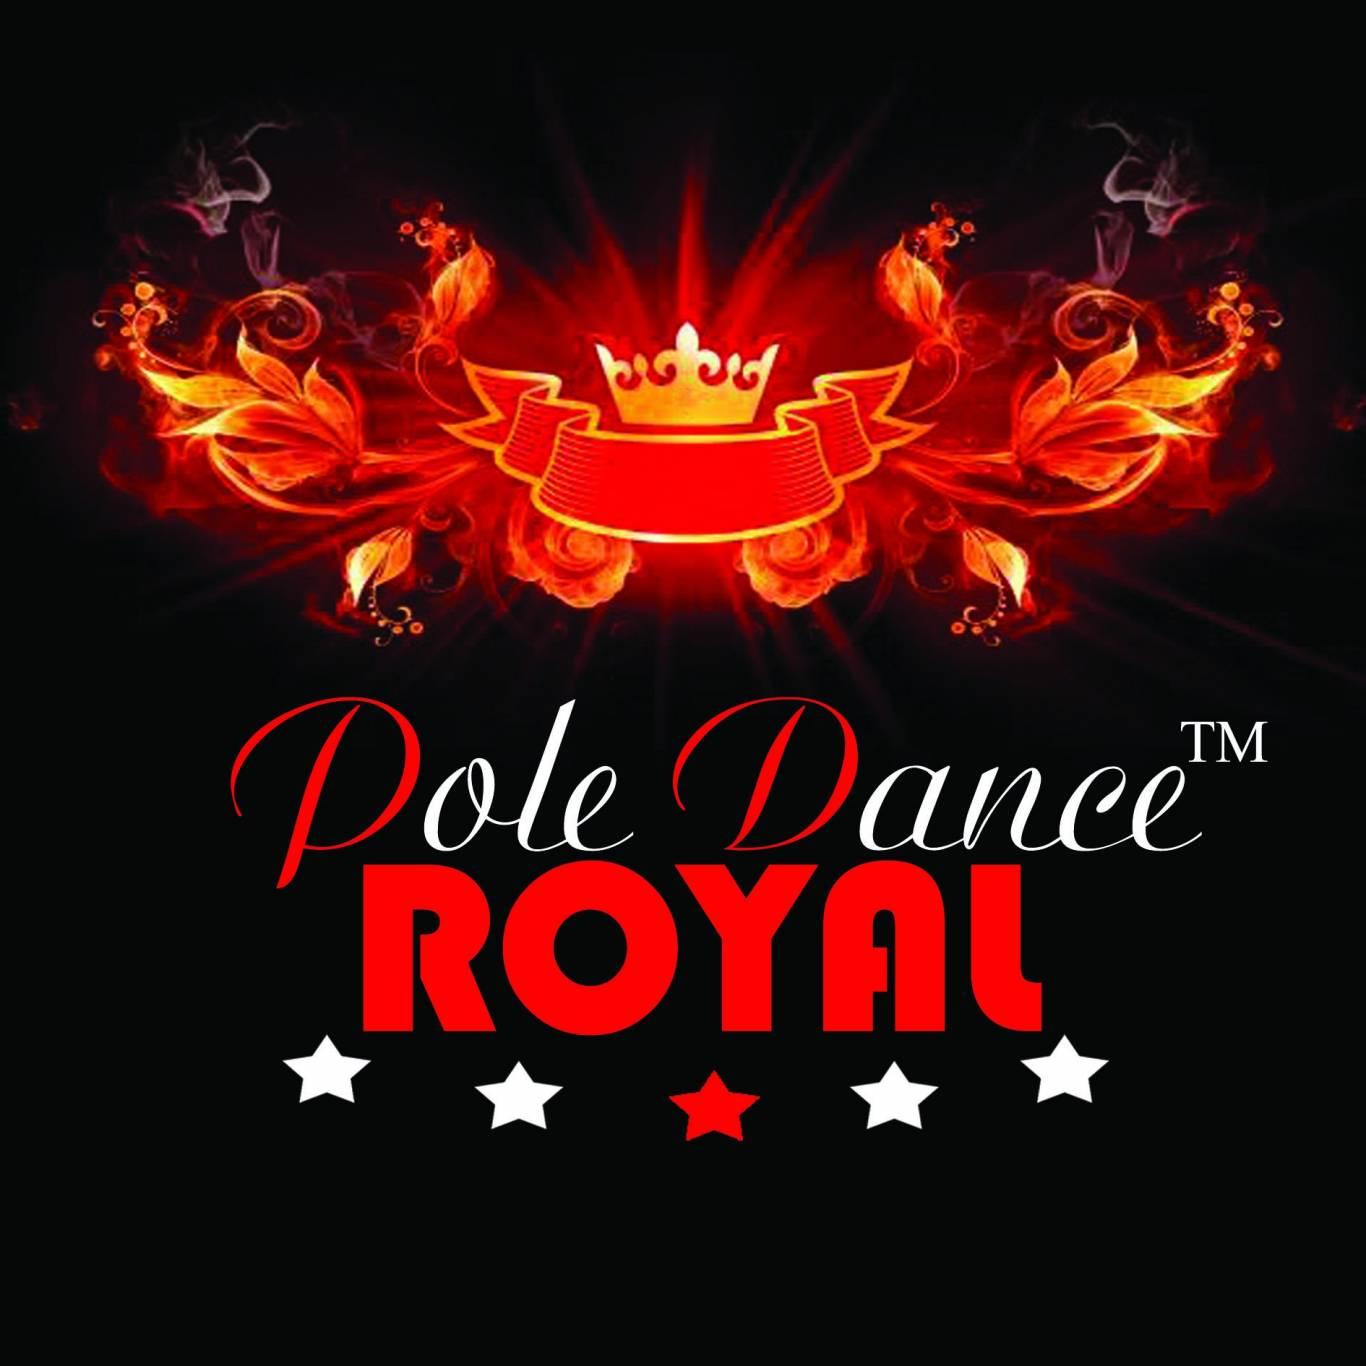 Занятие Pole Dance для детей (Pole Dance Kids)